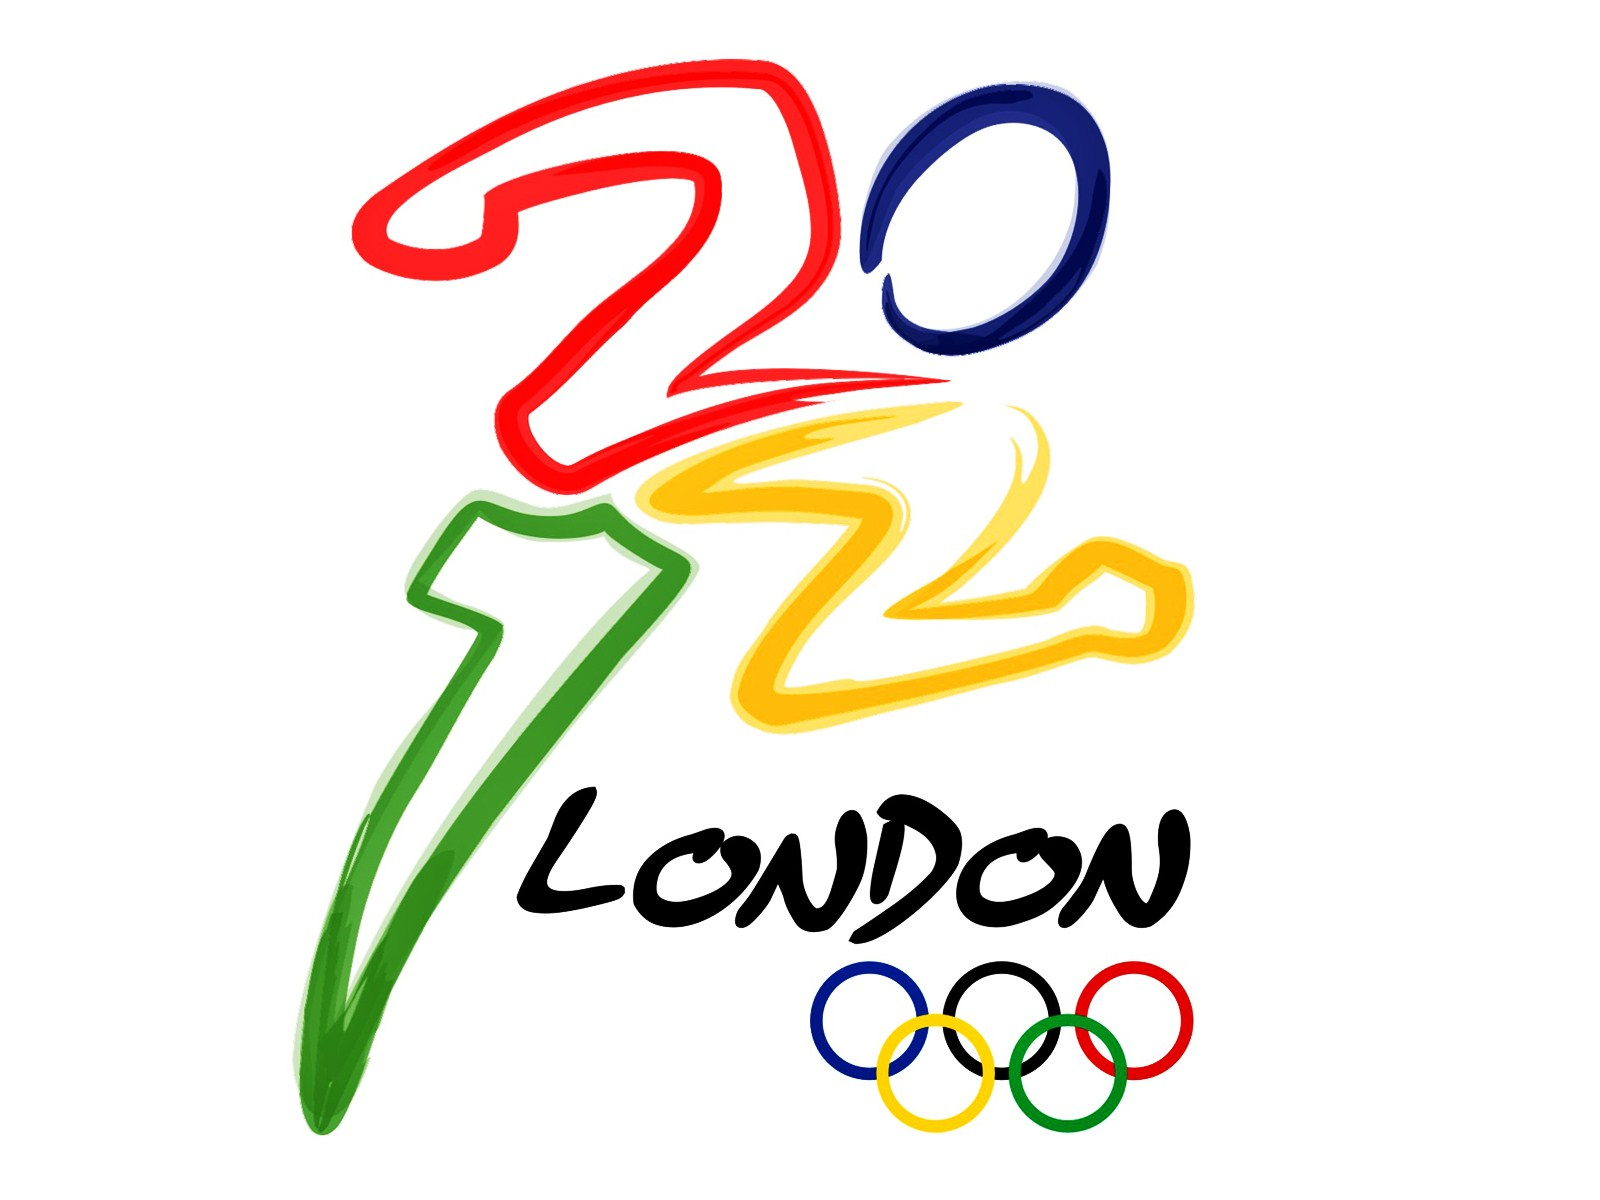 2012 london olympics essay The 2012 london olympic games essay, buy custom the 2012 london olympic games essay paper cheap, the 2012 london olympic games essay paper sample, the 2012 london.